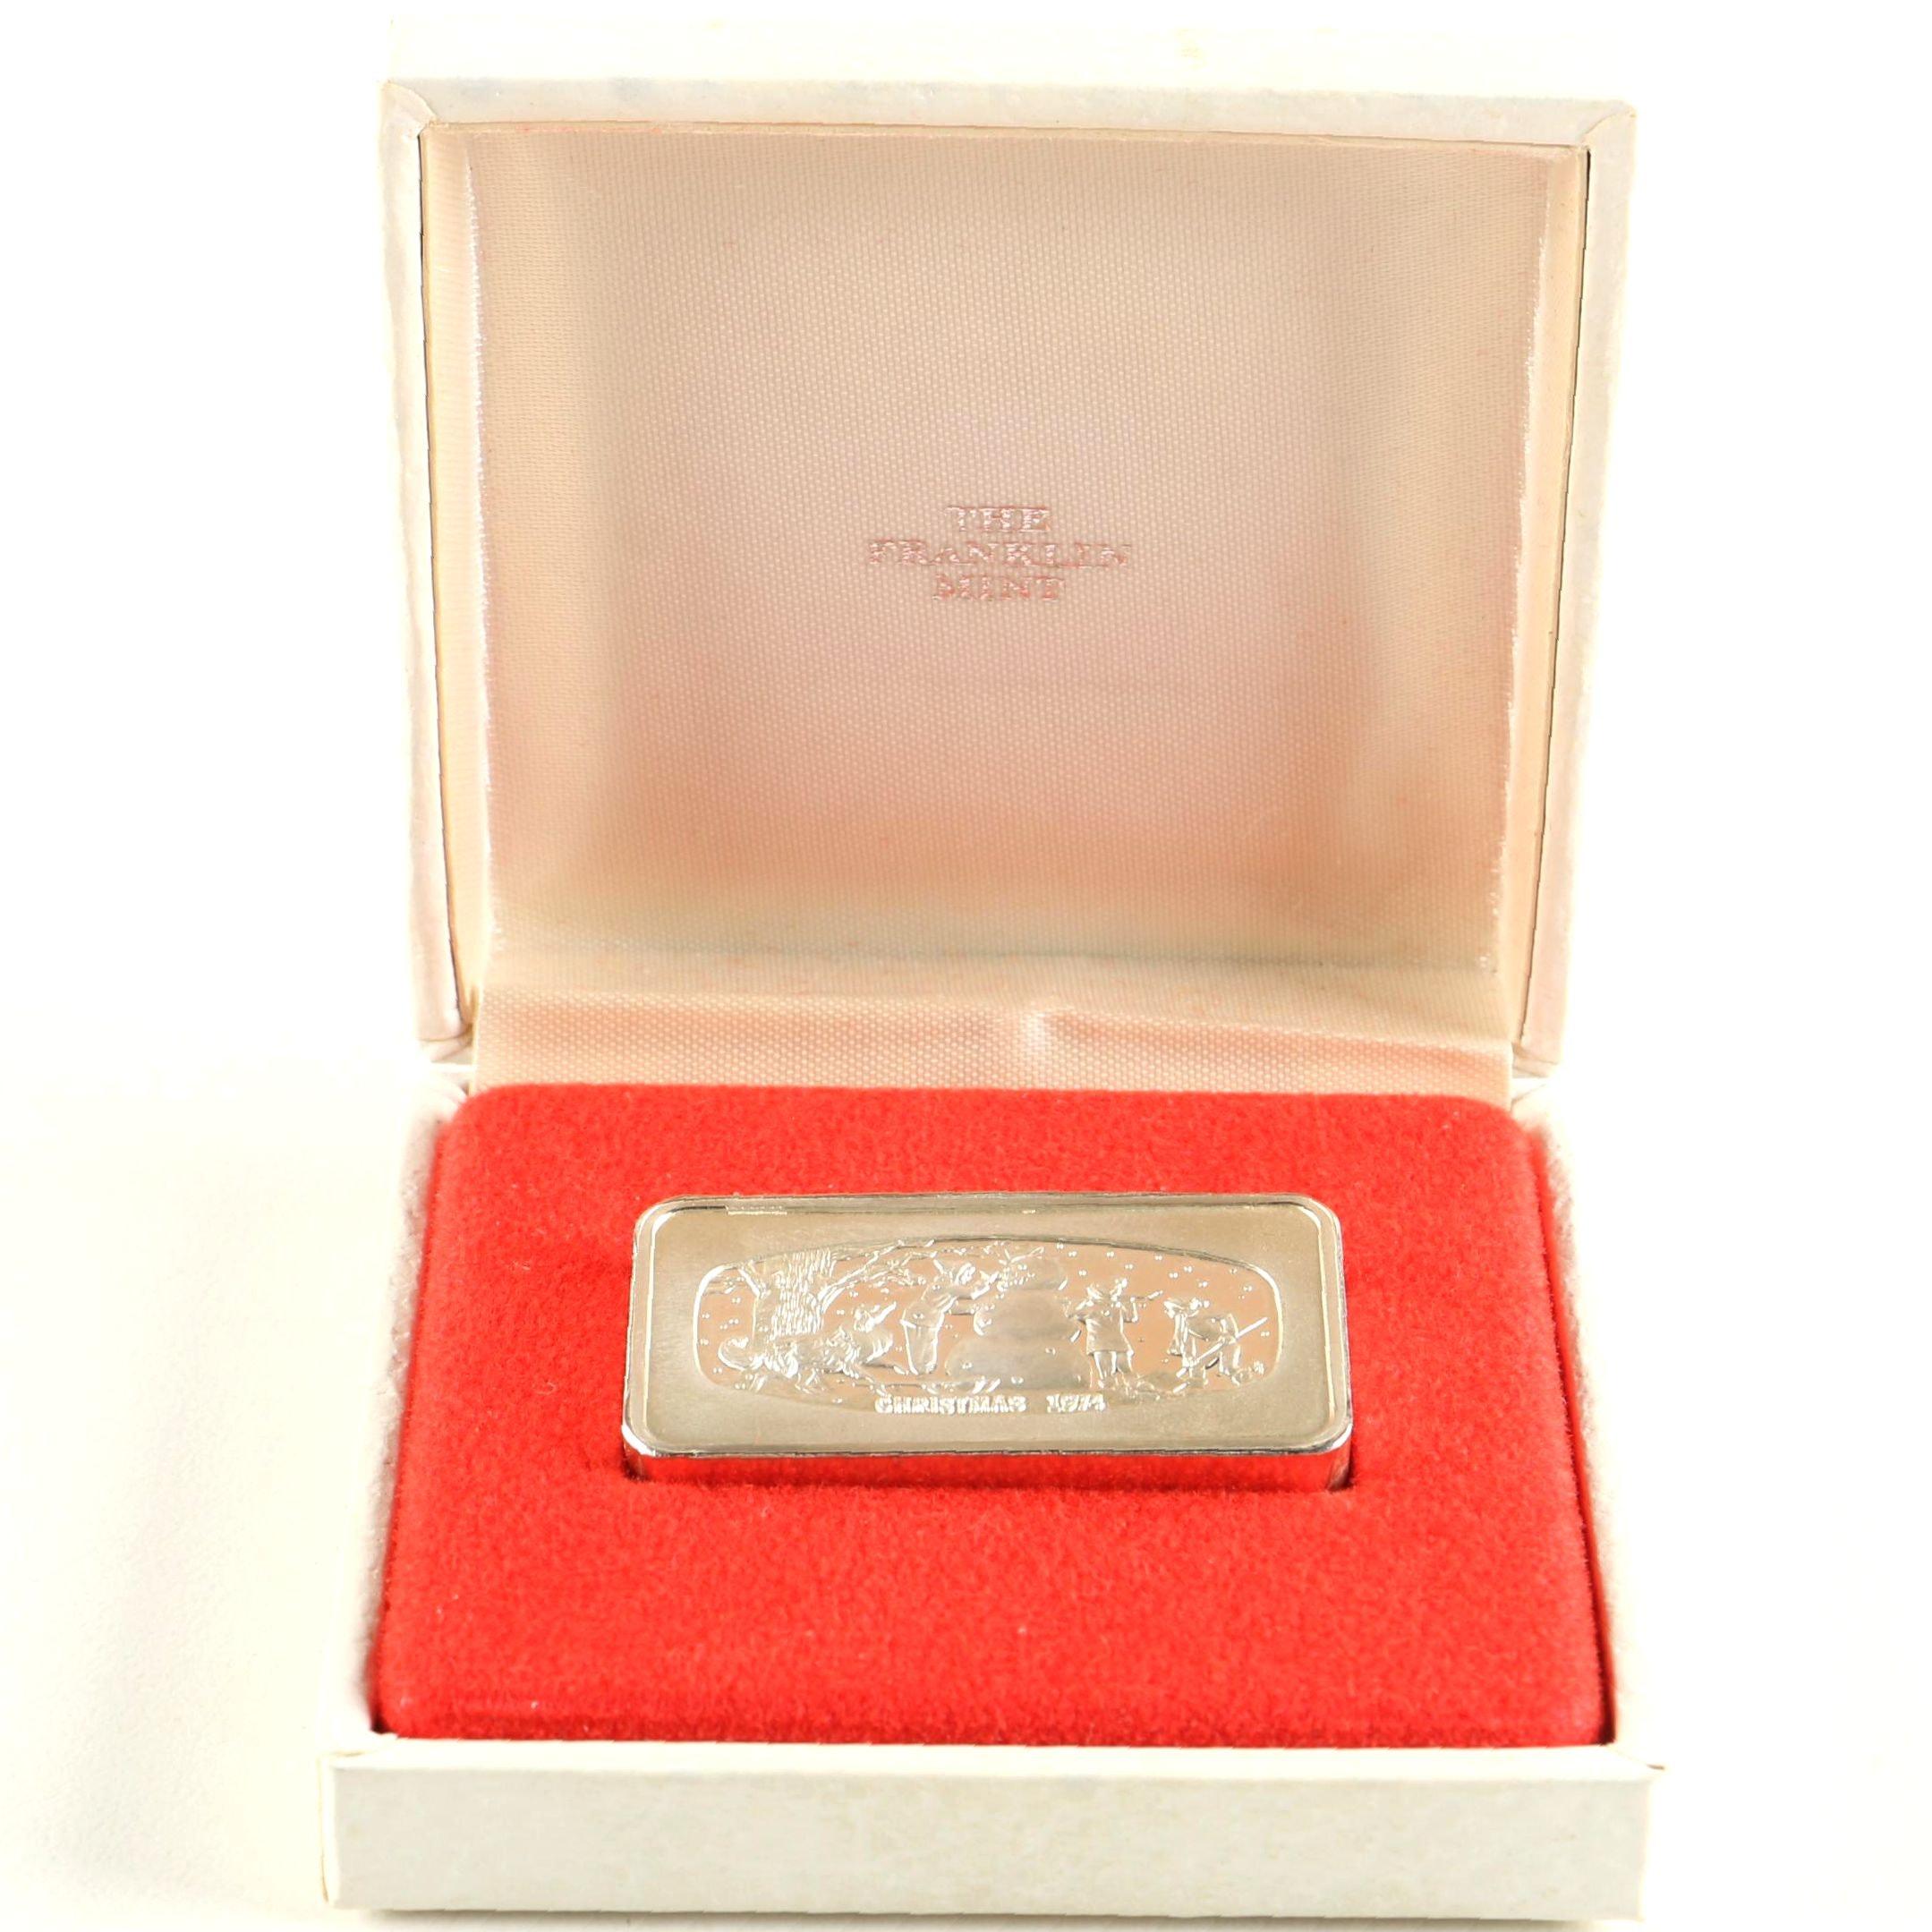 1974 Franklin Mint Christmas Sterling Silver Ingot